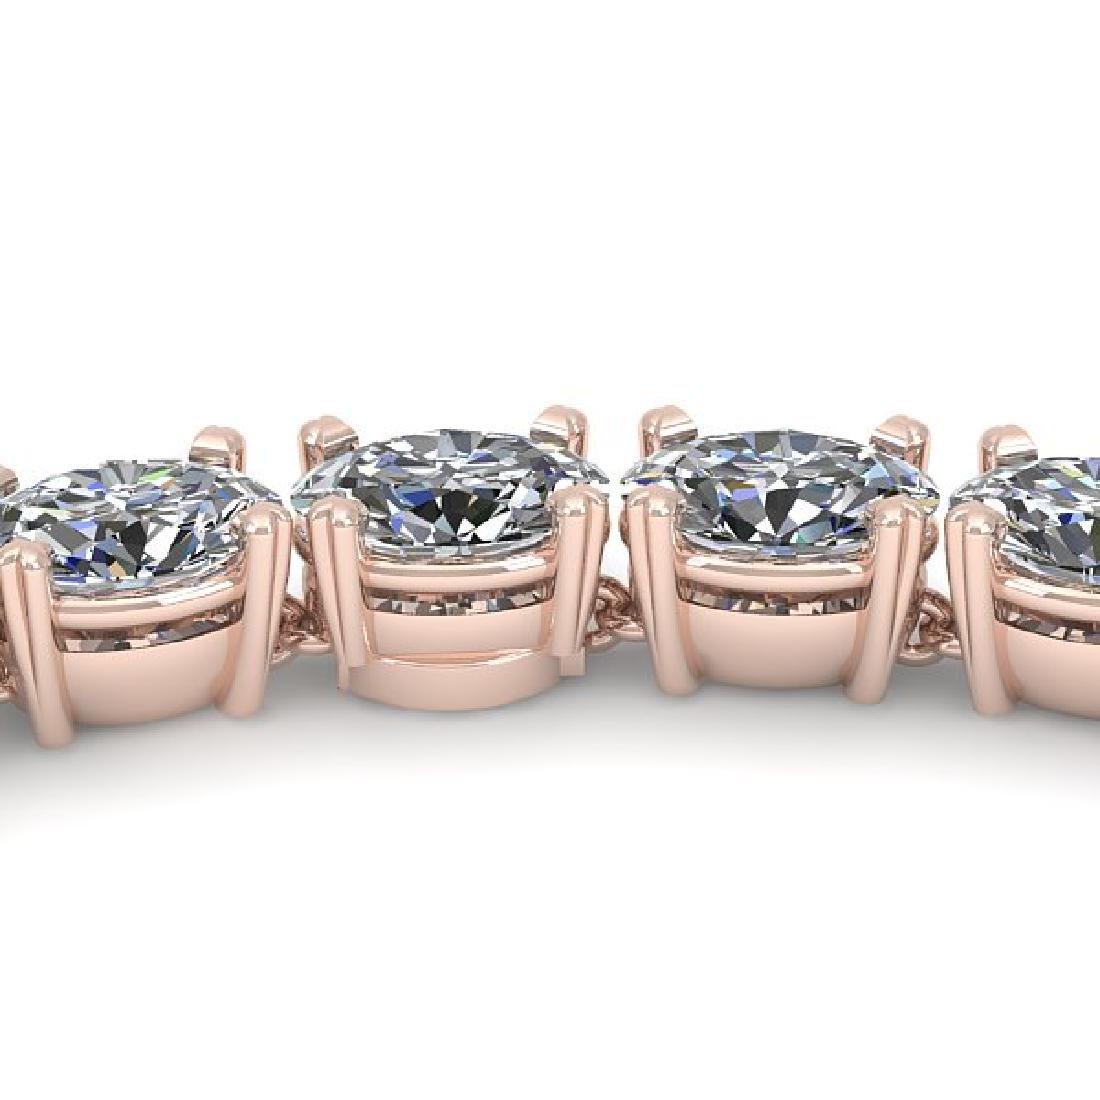 30 CTW Oval Cut Certified SI Diamond Necklace 18K Rose